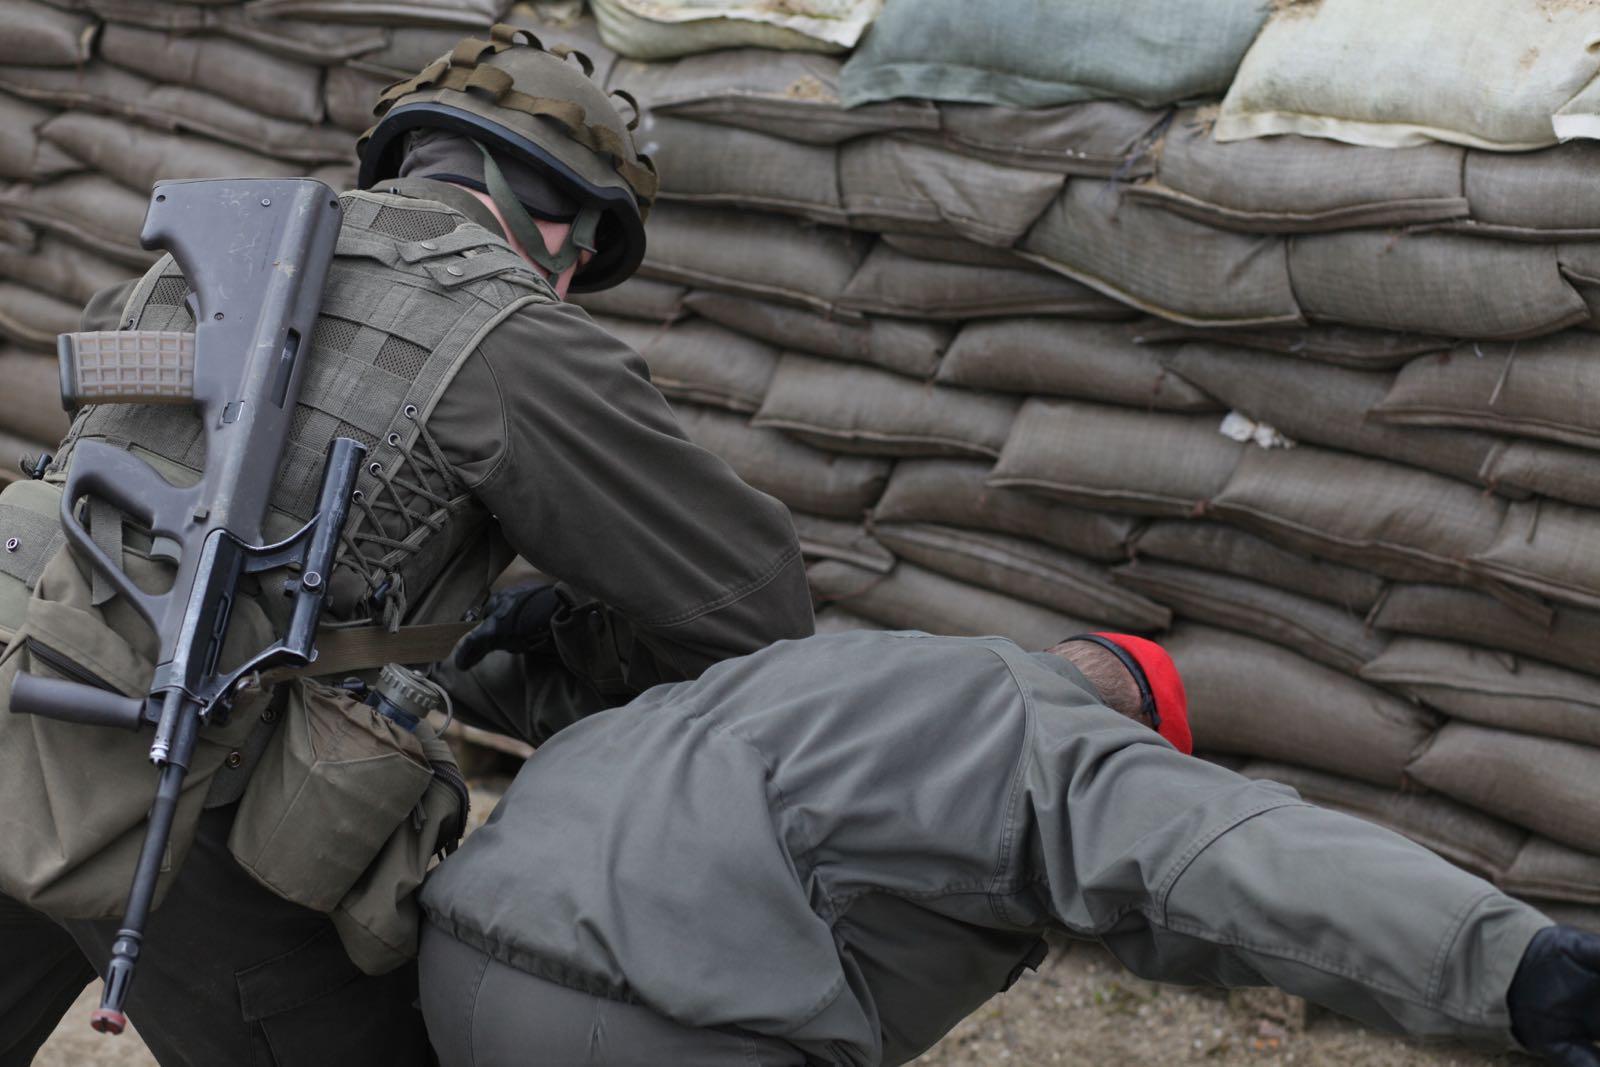 2019_02_06_1Gardekompanie_AssE_Checkpoint - 5 of 10